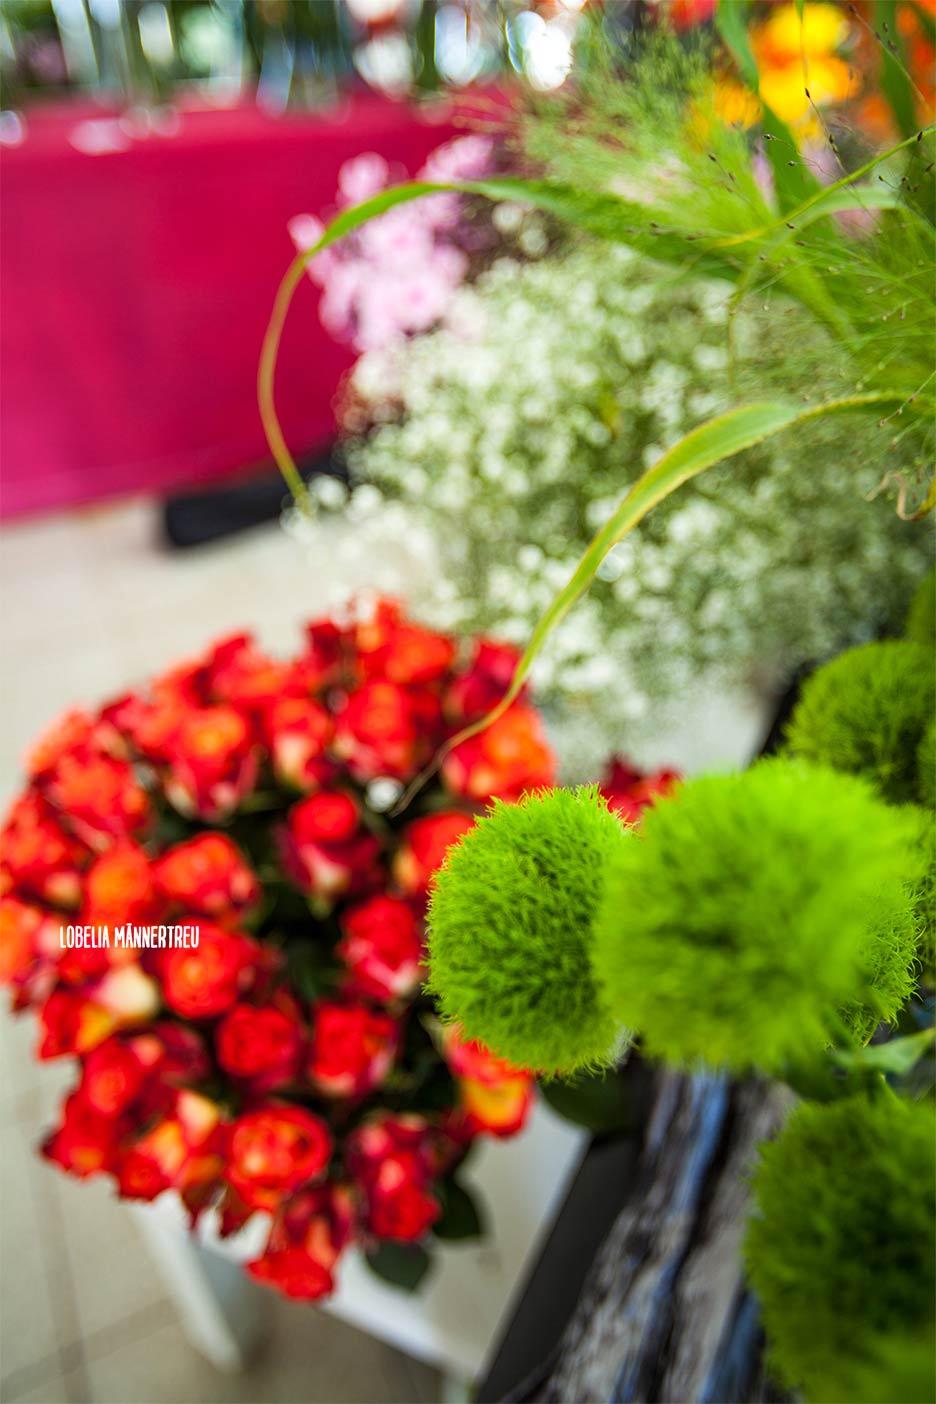 LOBELIA Maennertreu Ihr Blumenfachgeschaeft in Hohen Neuendorf